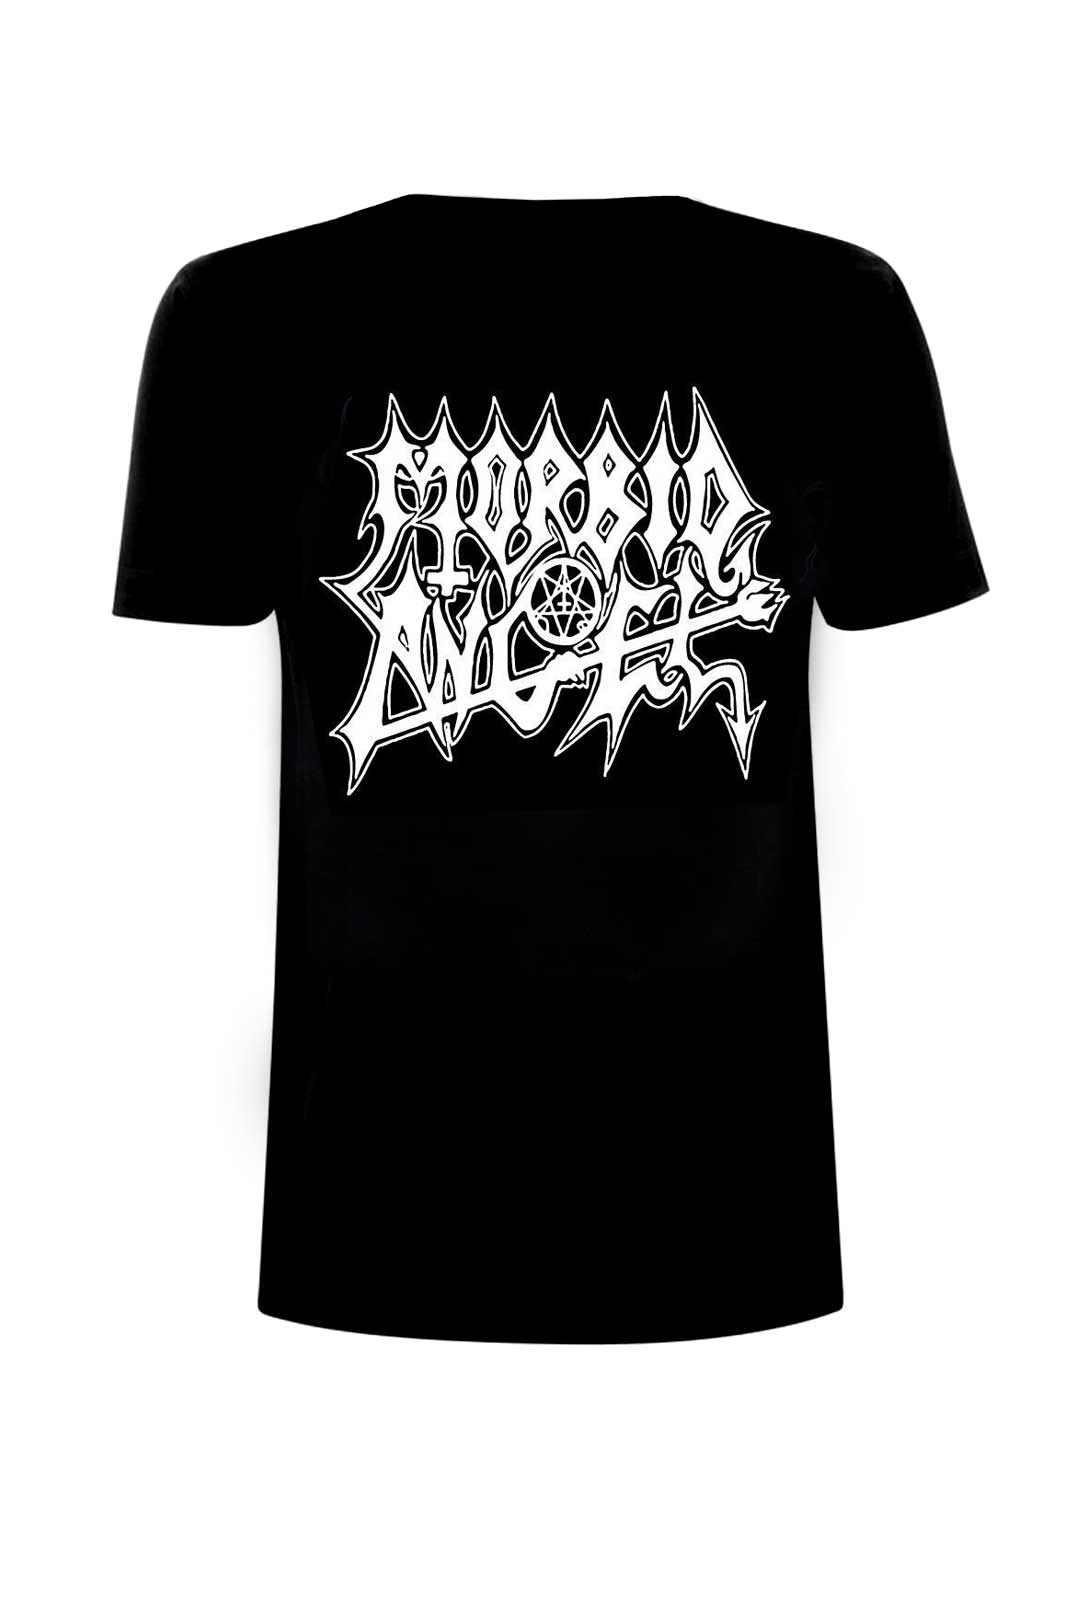 Morbid Angel Extreme Music Tee Front